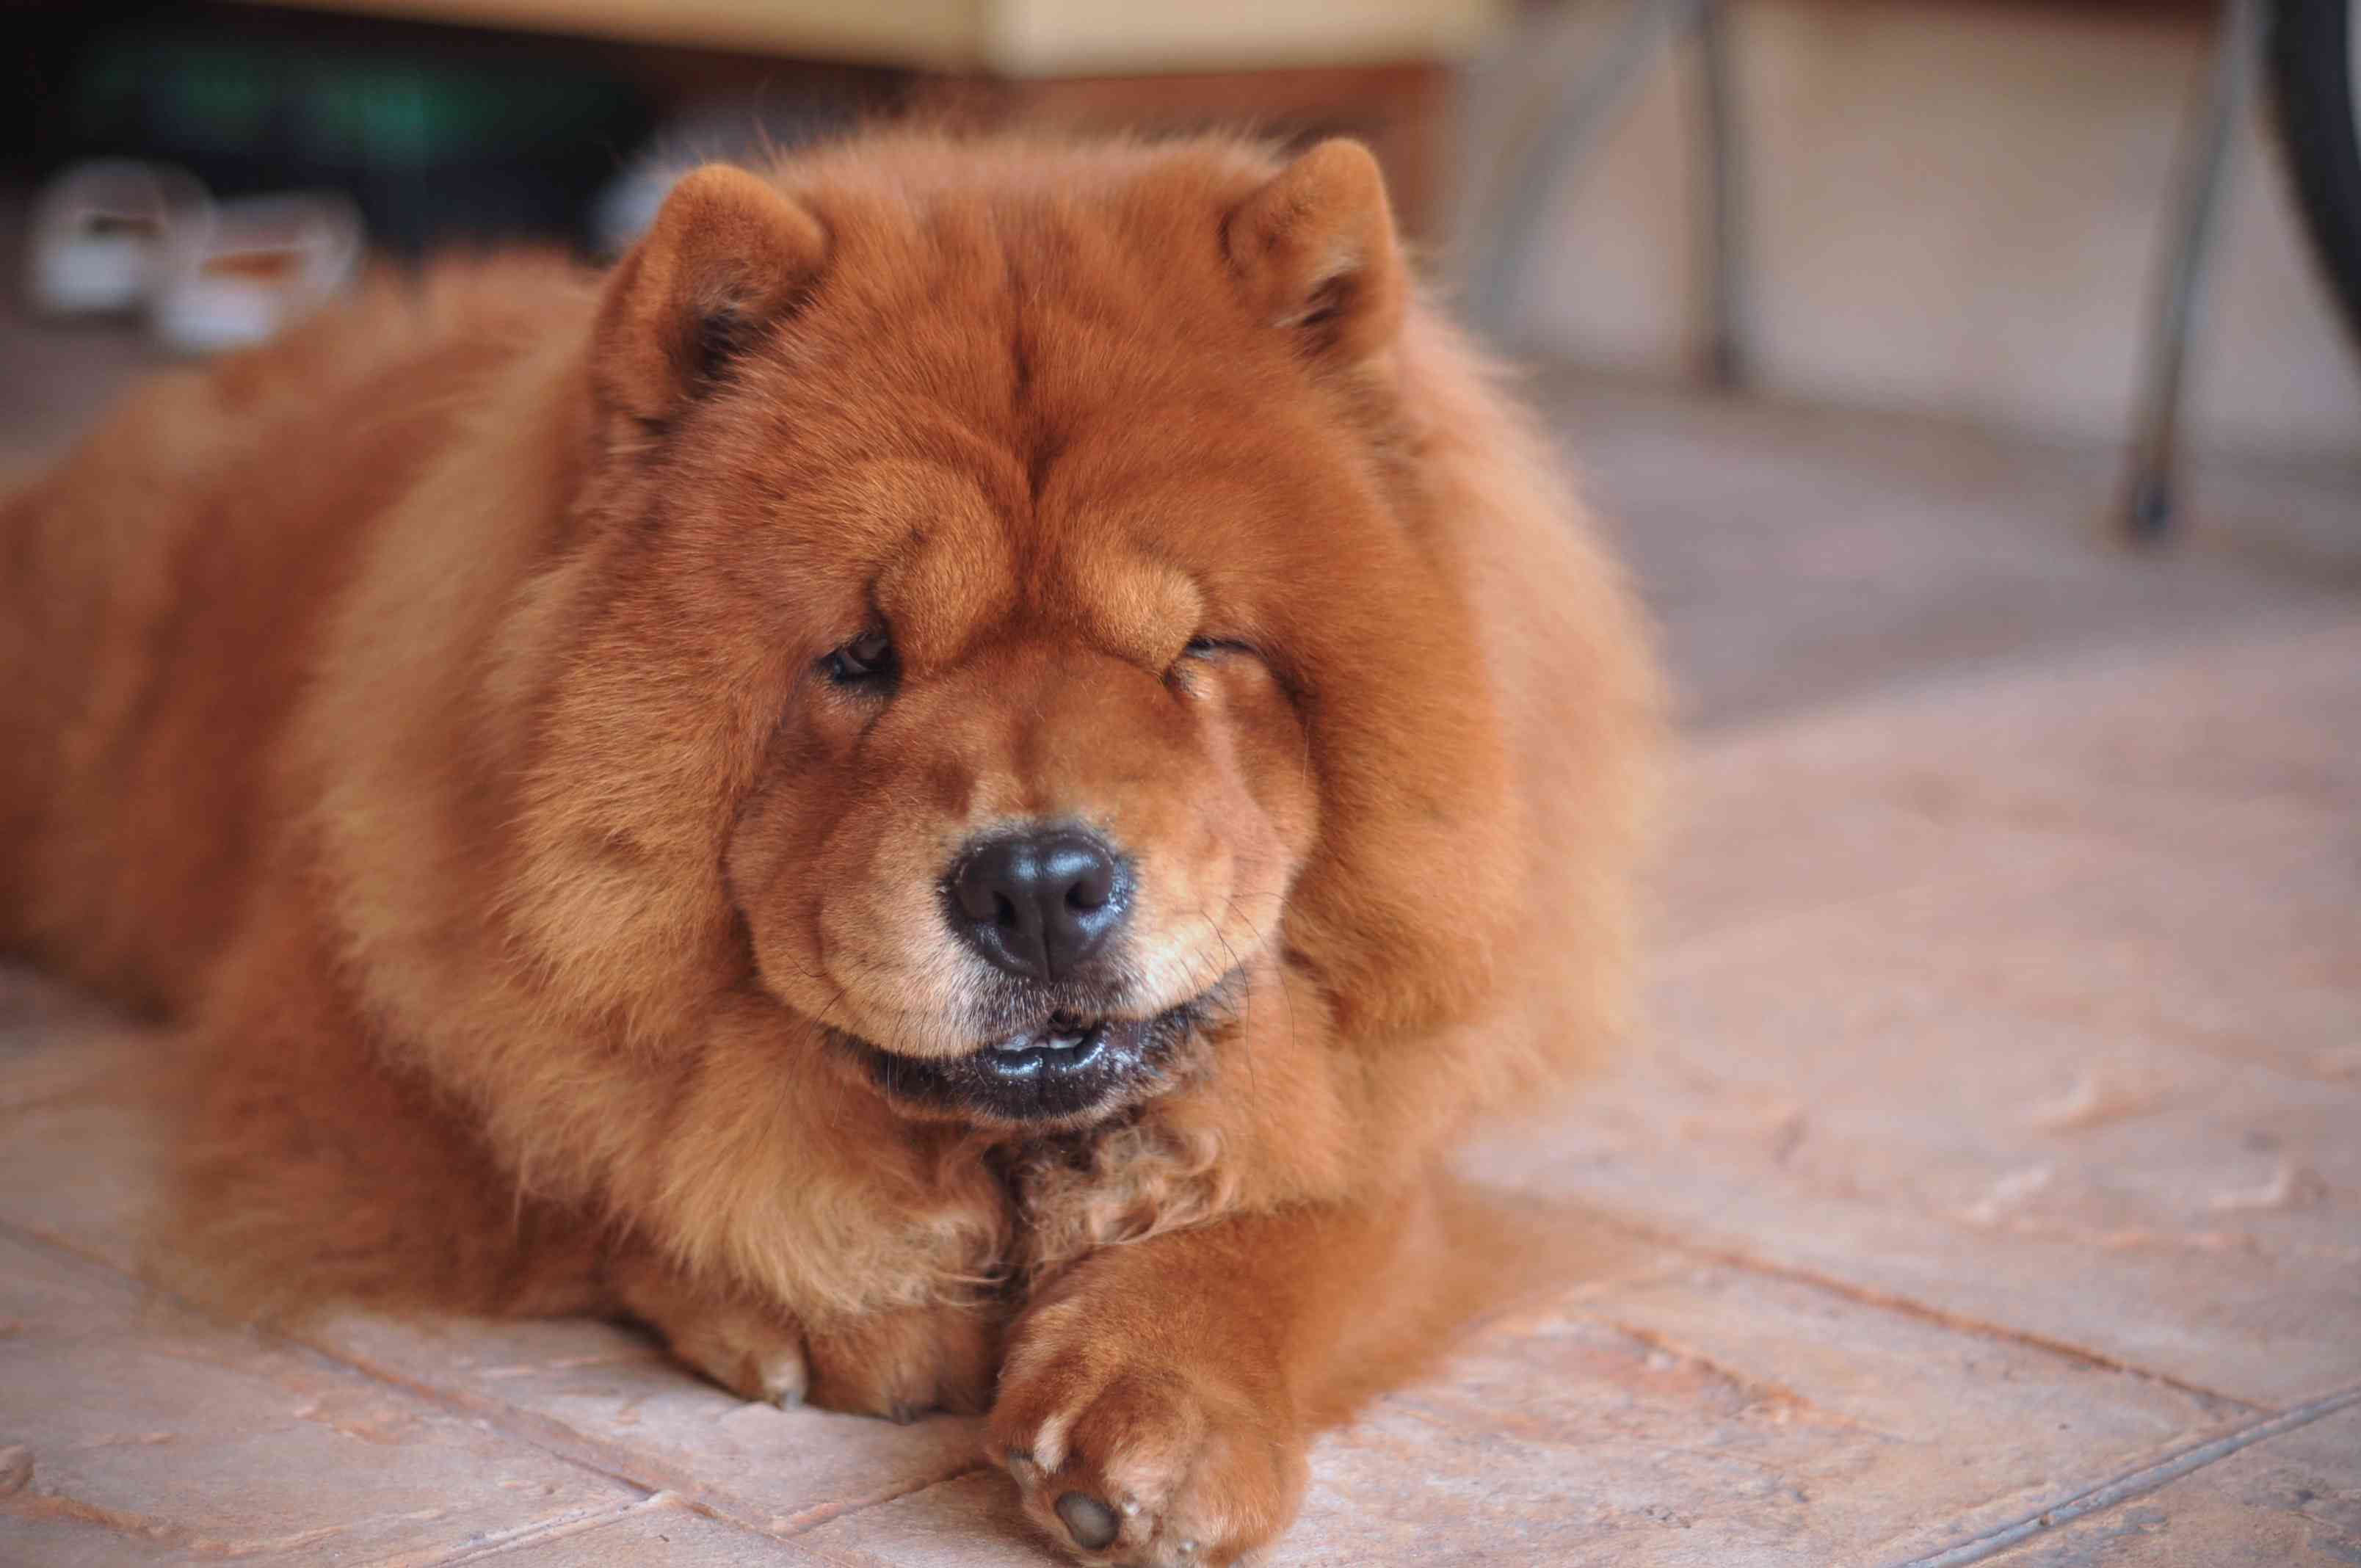 Chow chow spitz dog breed lying on floor